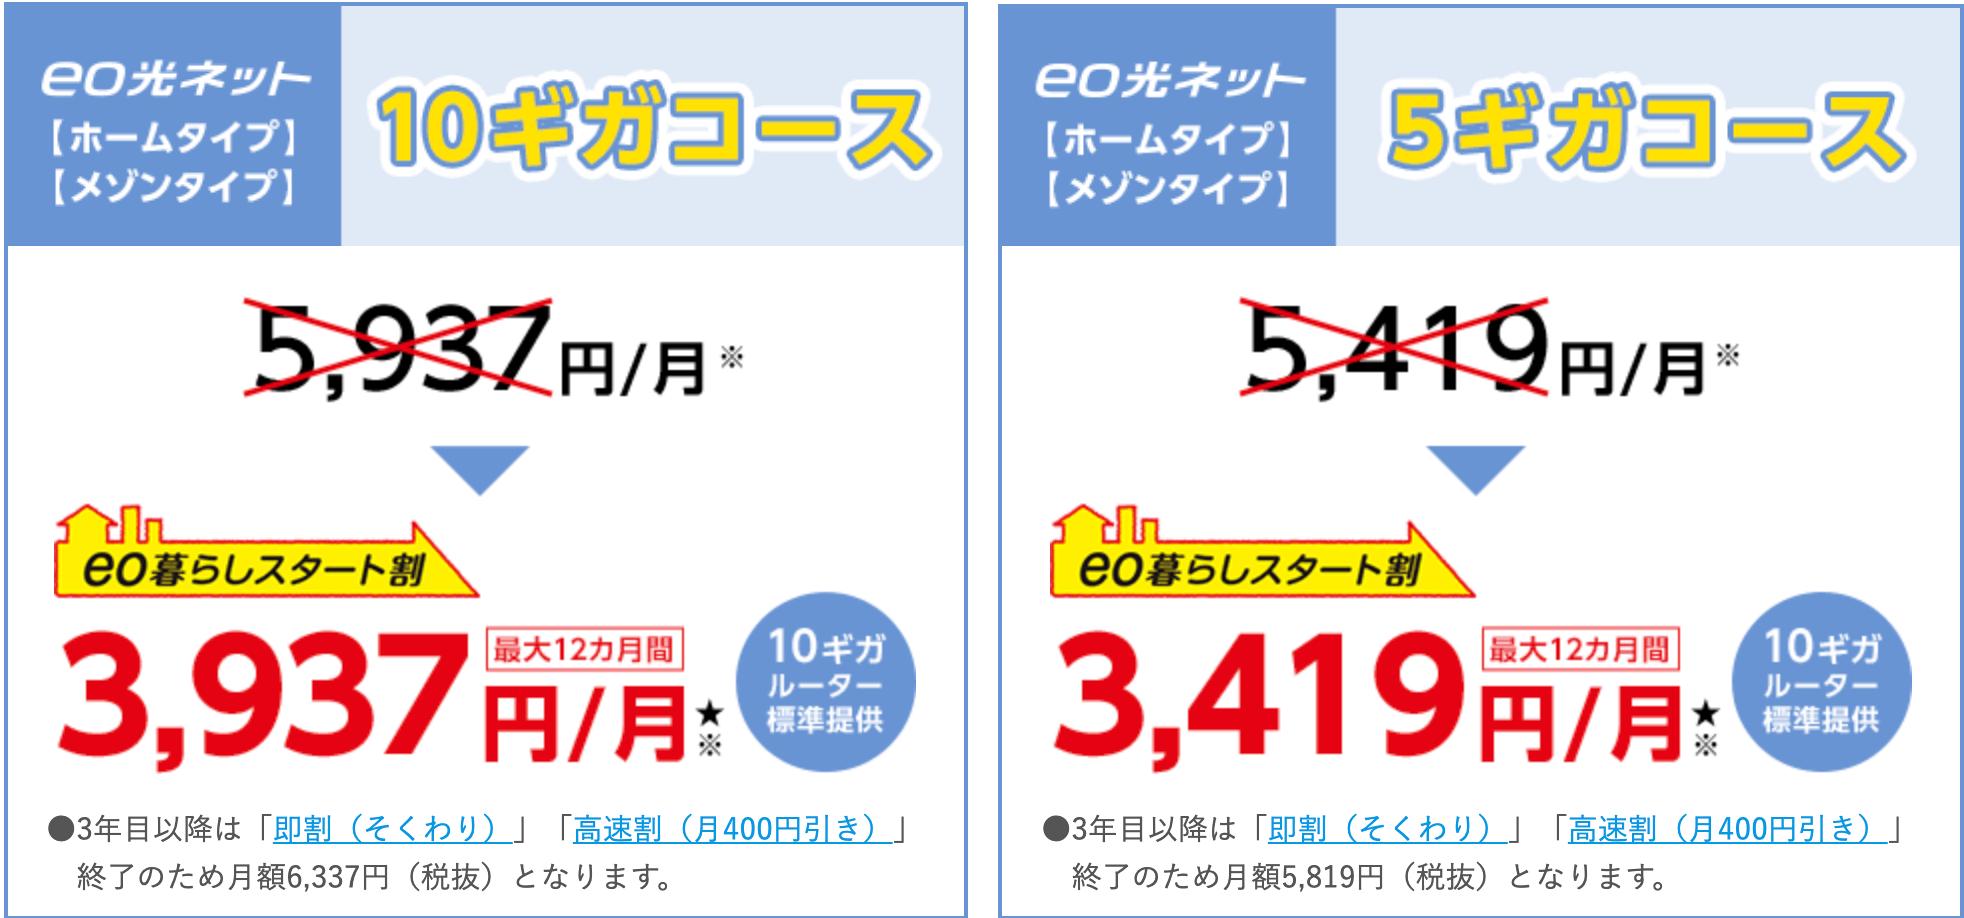 eo光10G5Gコース月額料金